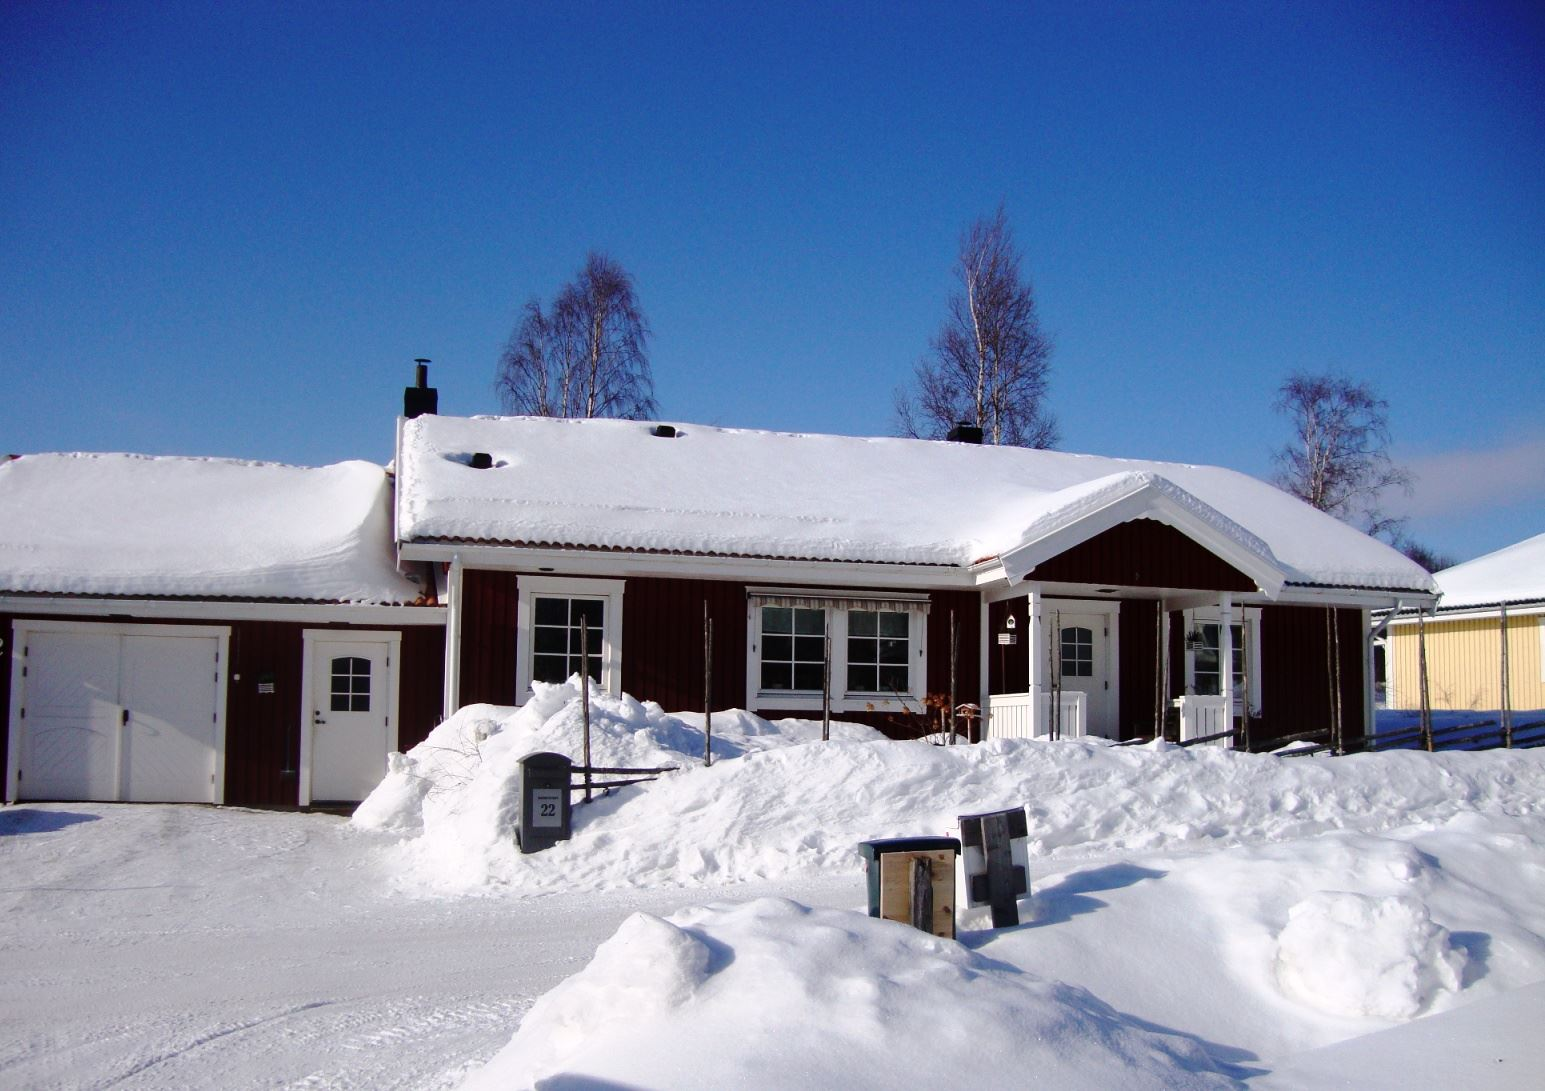 Privatrum M216, Sångåkersvägen, Mora-Noret, Mora